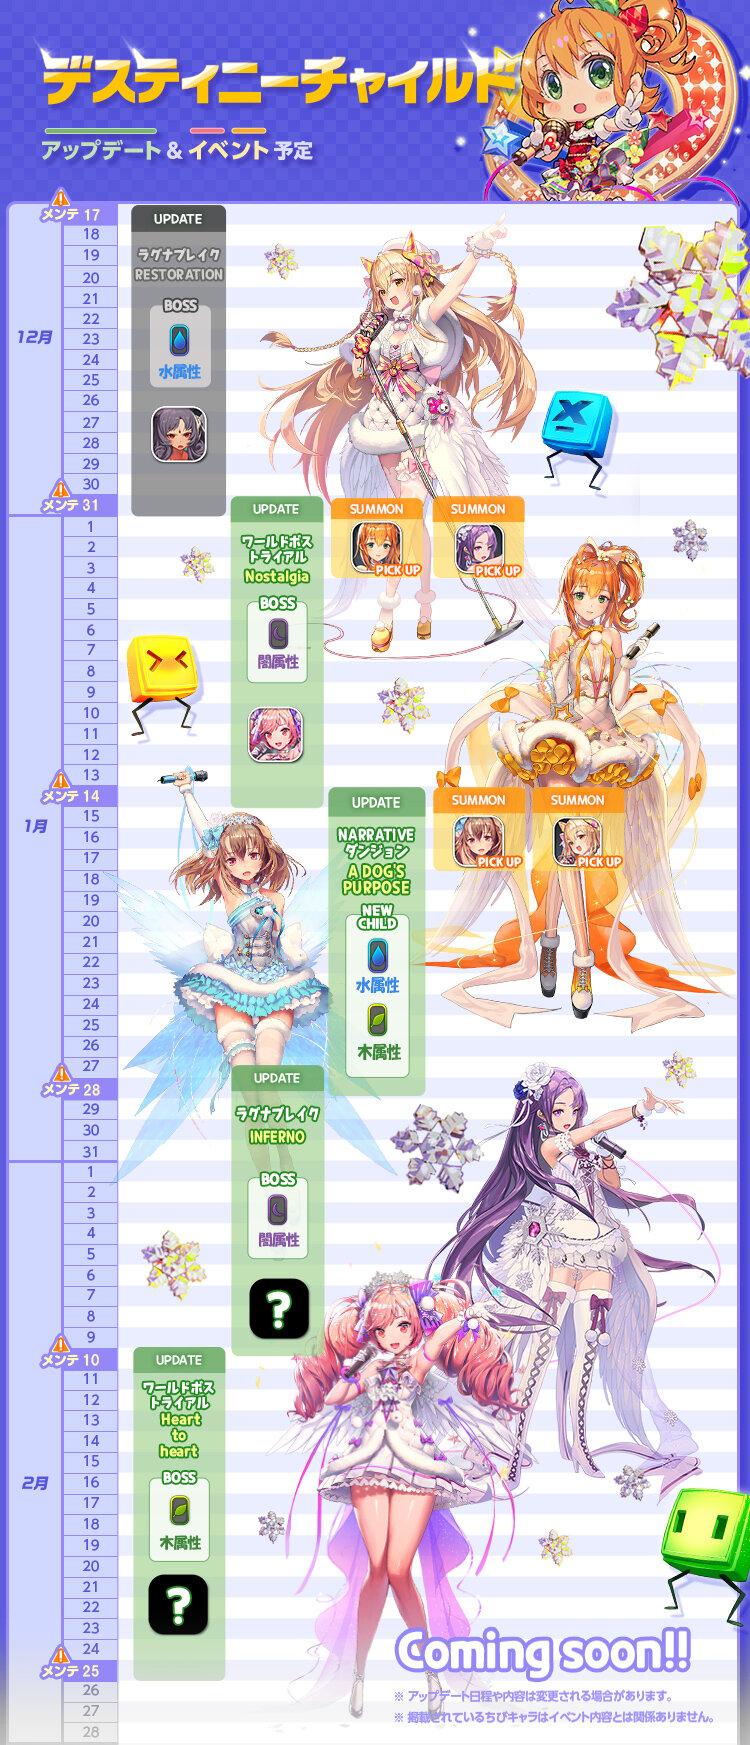 DCJP_スケジュール_V13_1217(nakamura調整版)